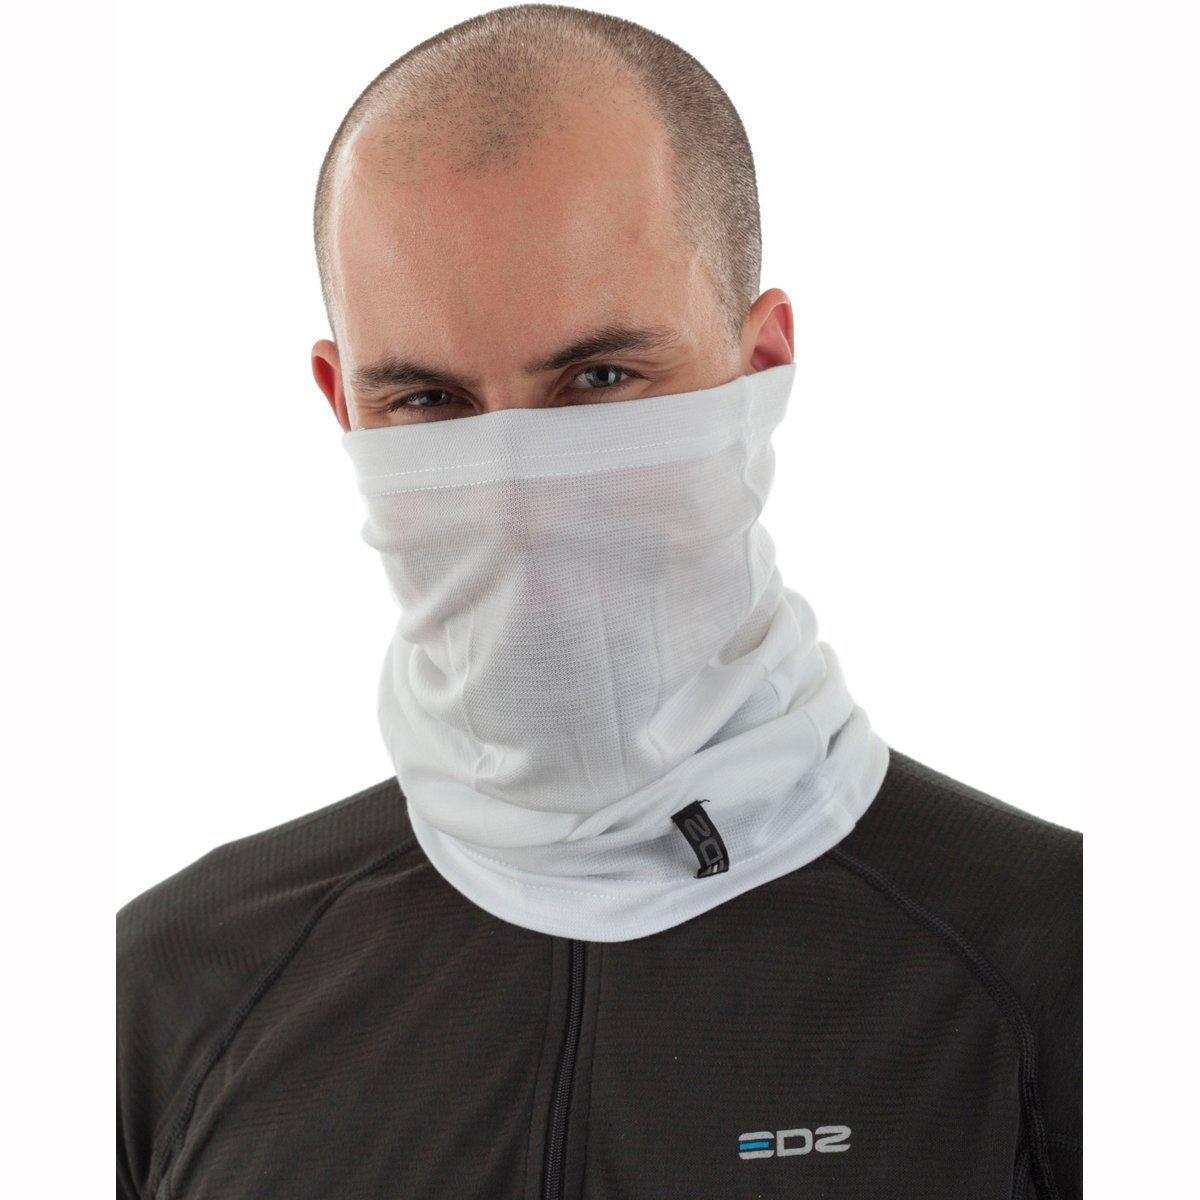 Edz All Climate Neck Warmer White